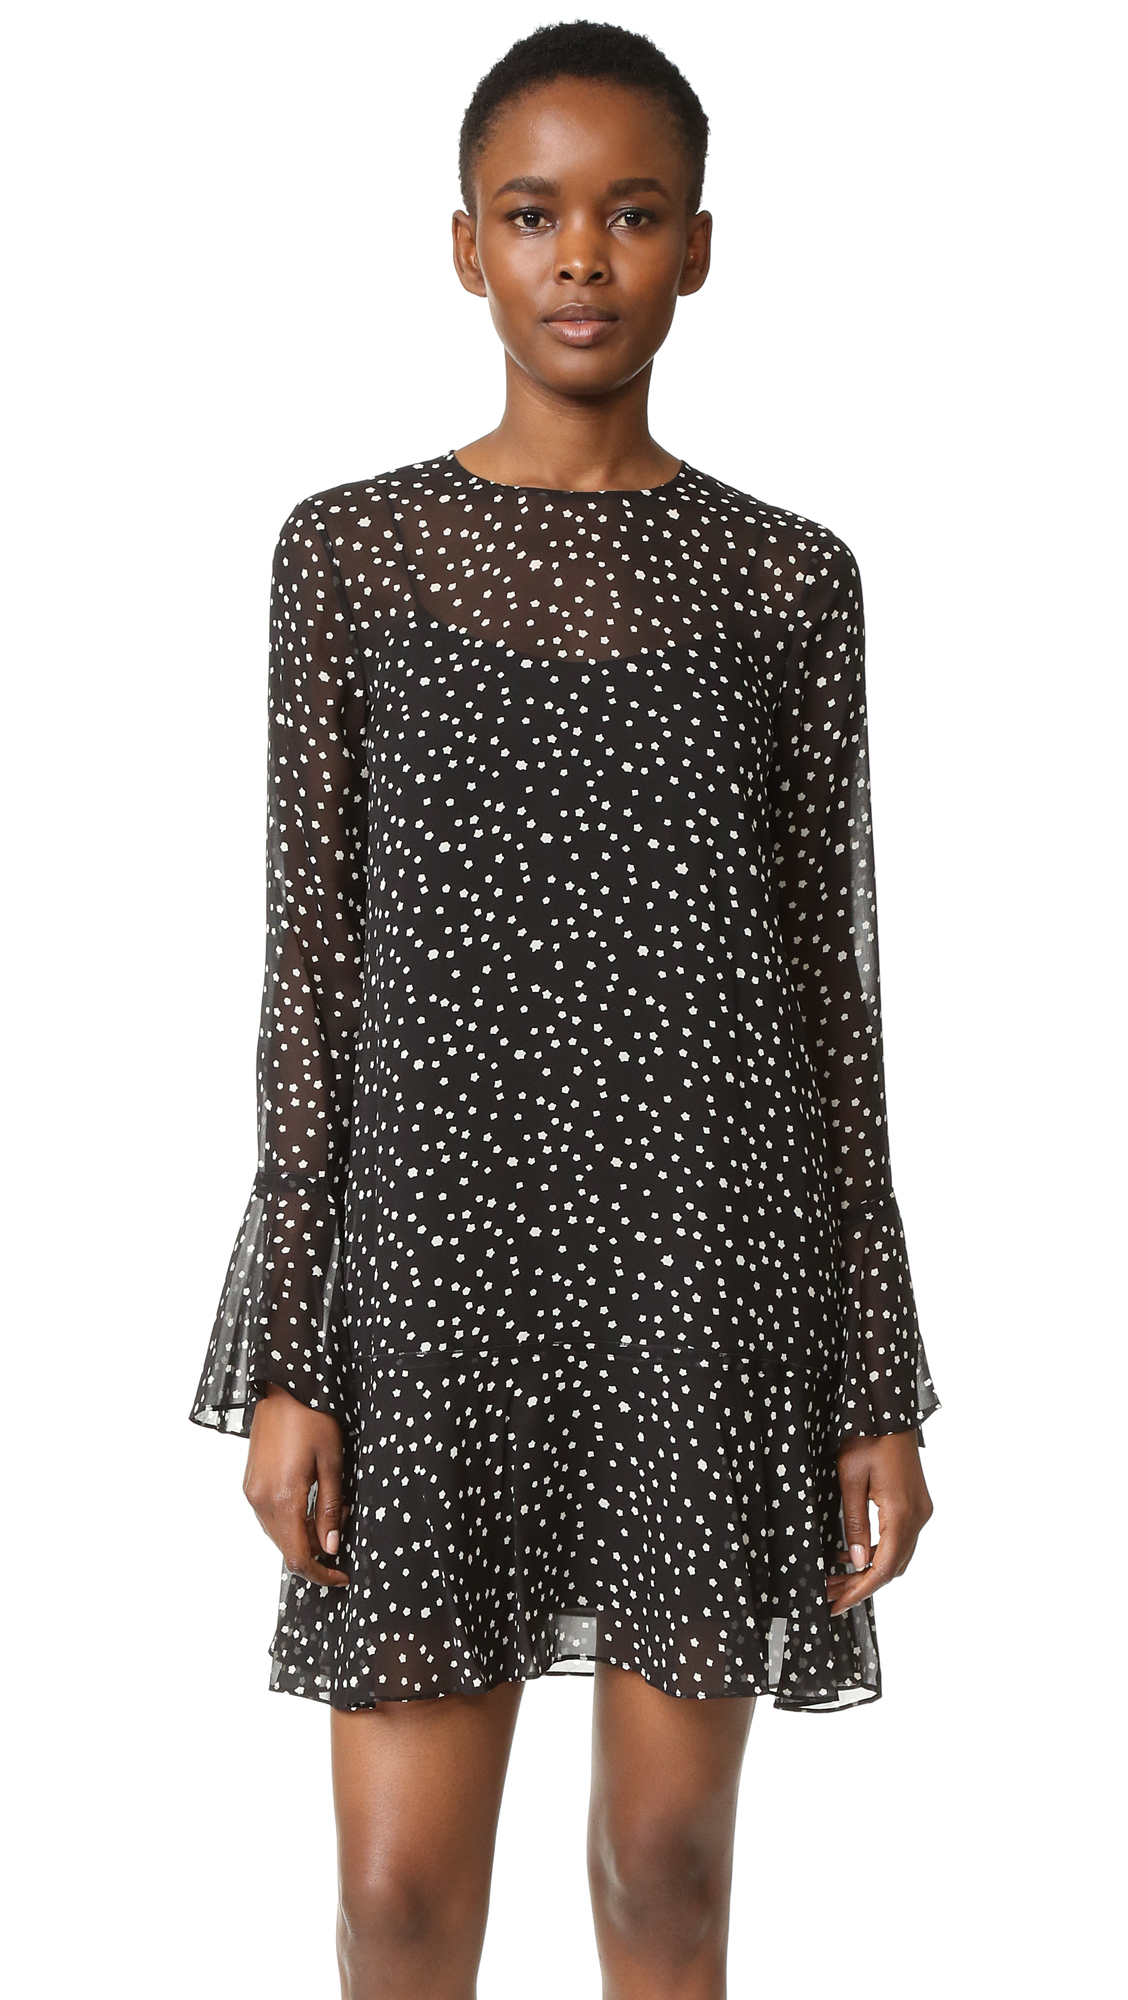 Theory Marah Starry Print Dress - Black/Ivory at Shopbop